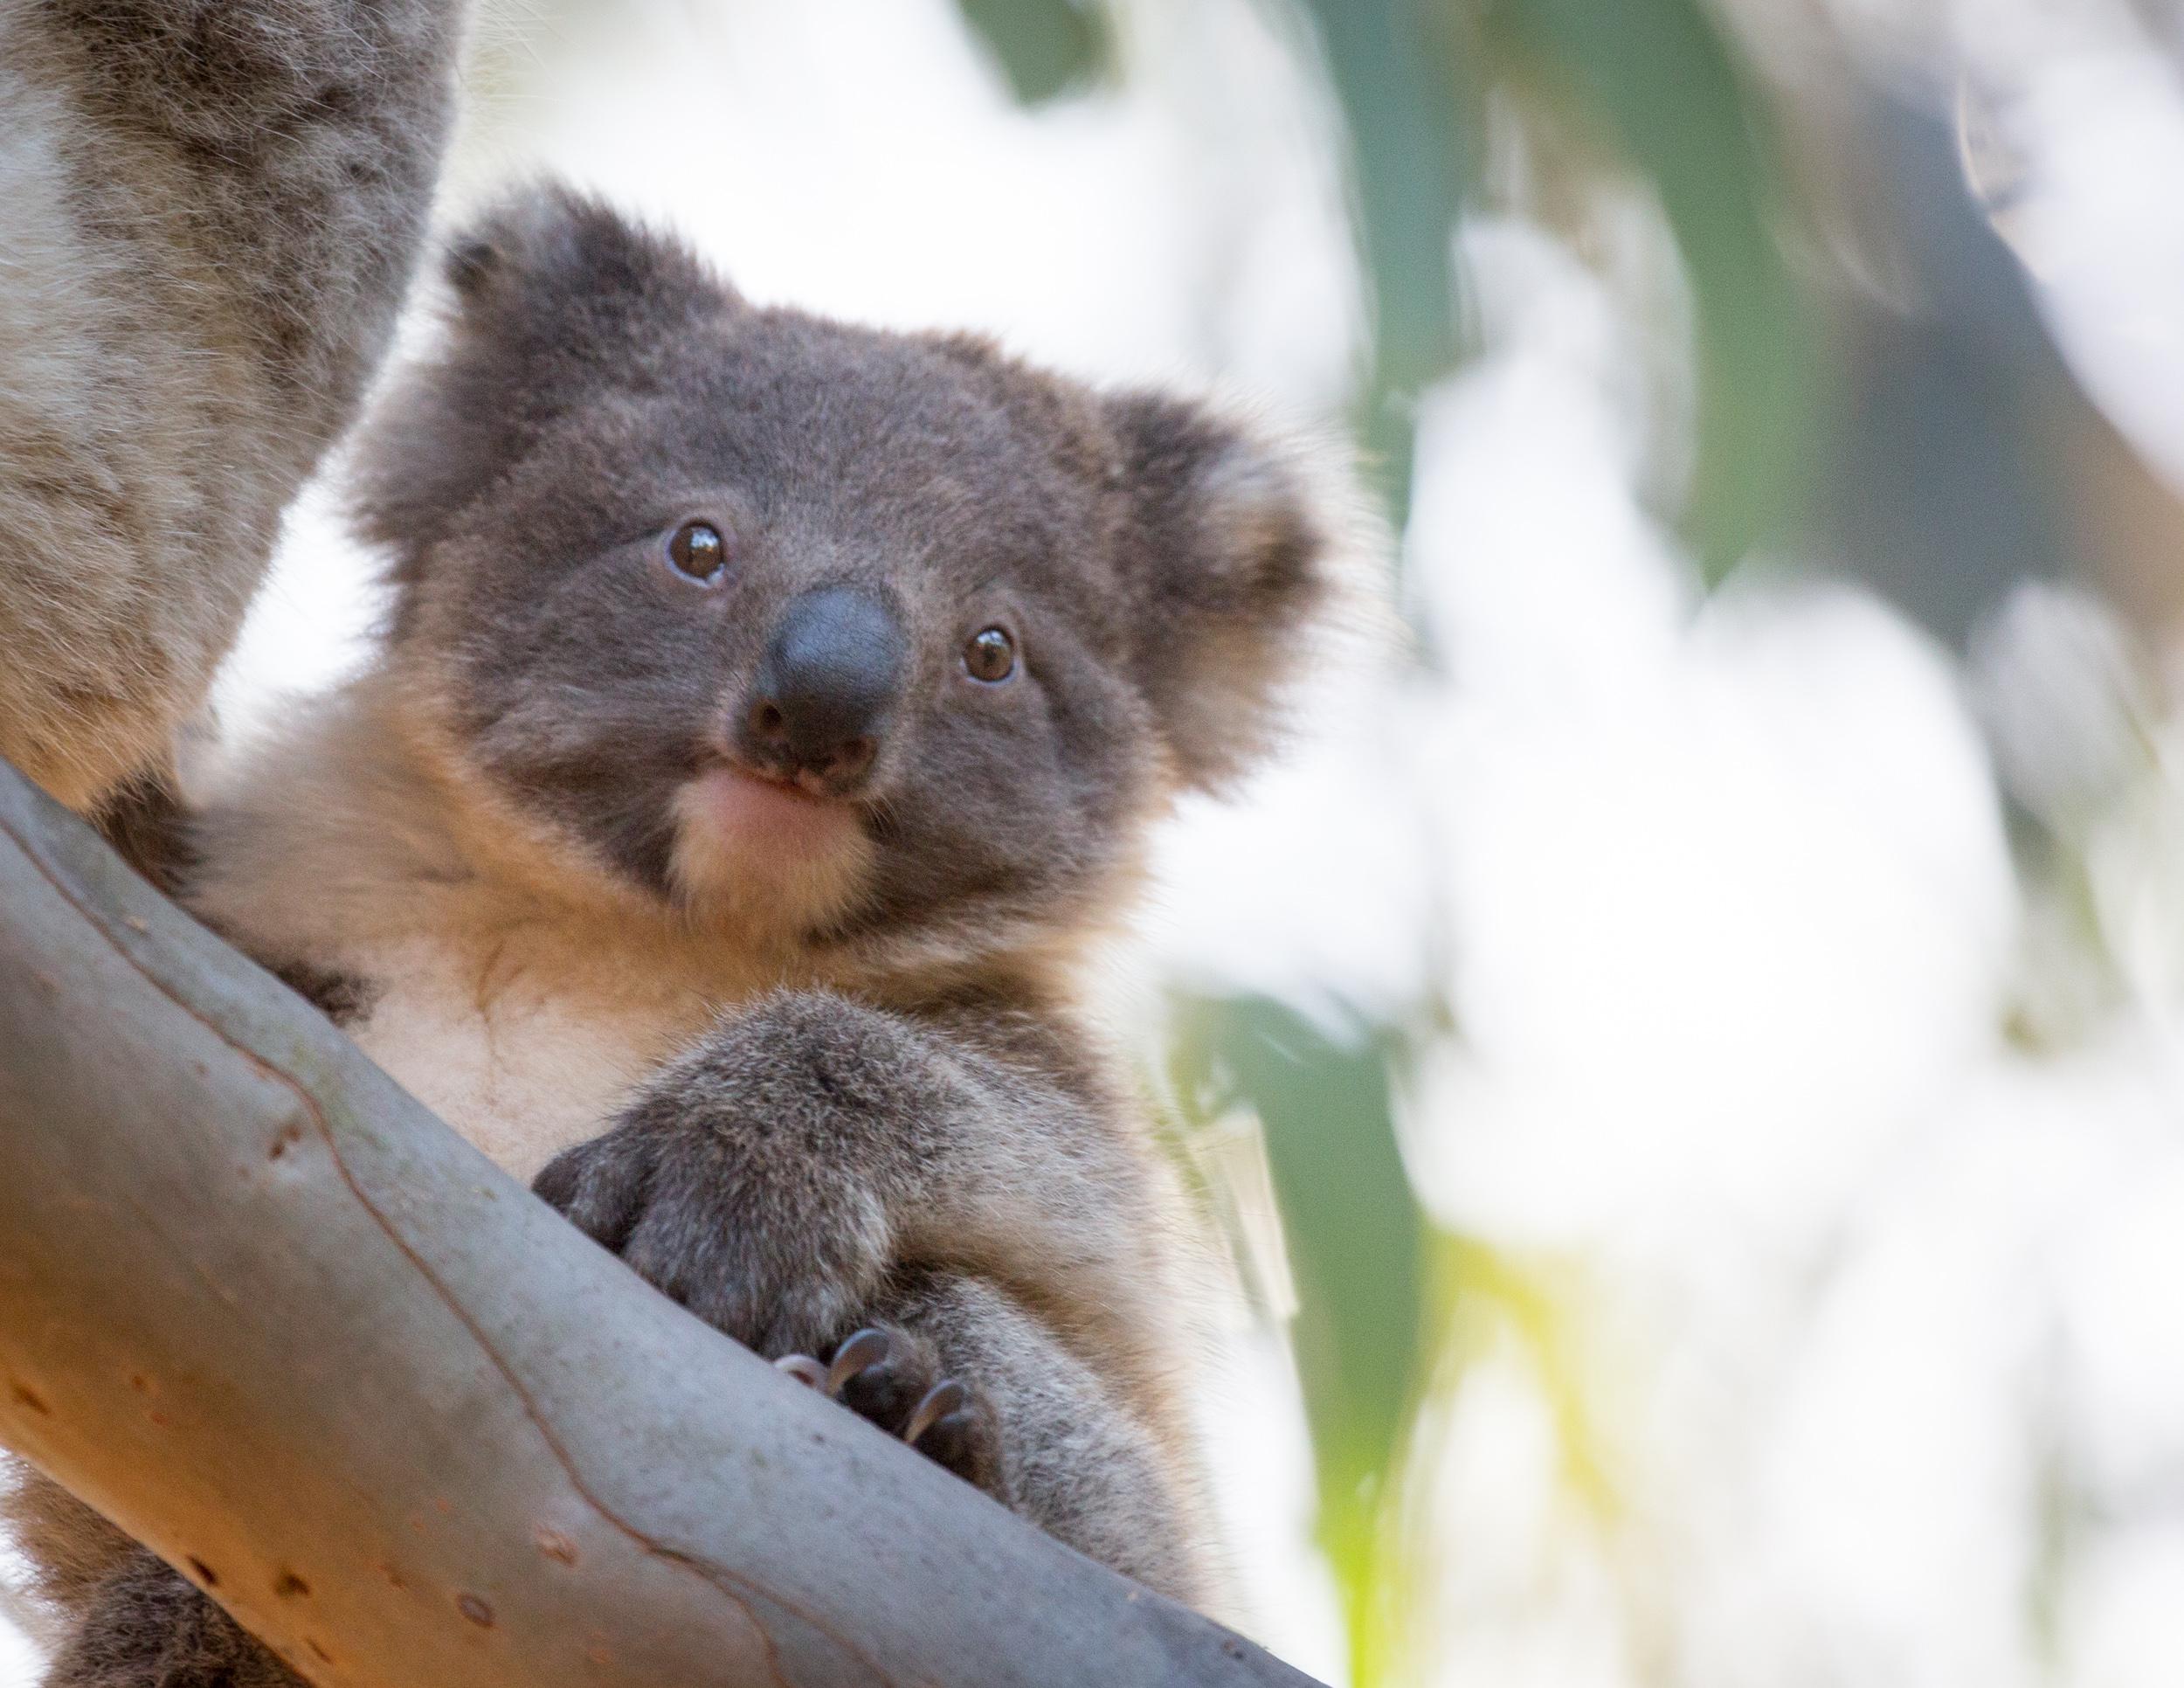 One of the koalas at Hanson Bay, Kangaroo Island